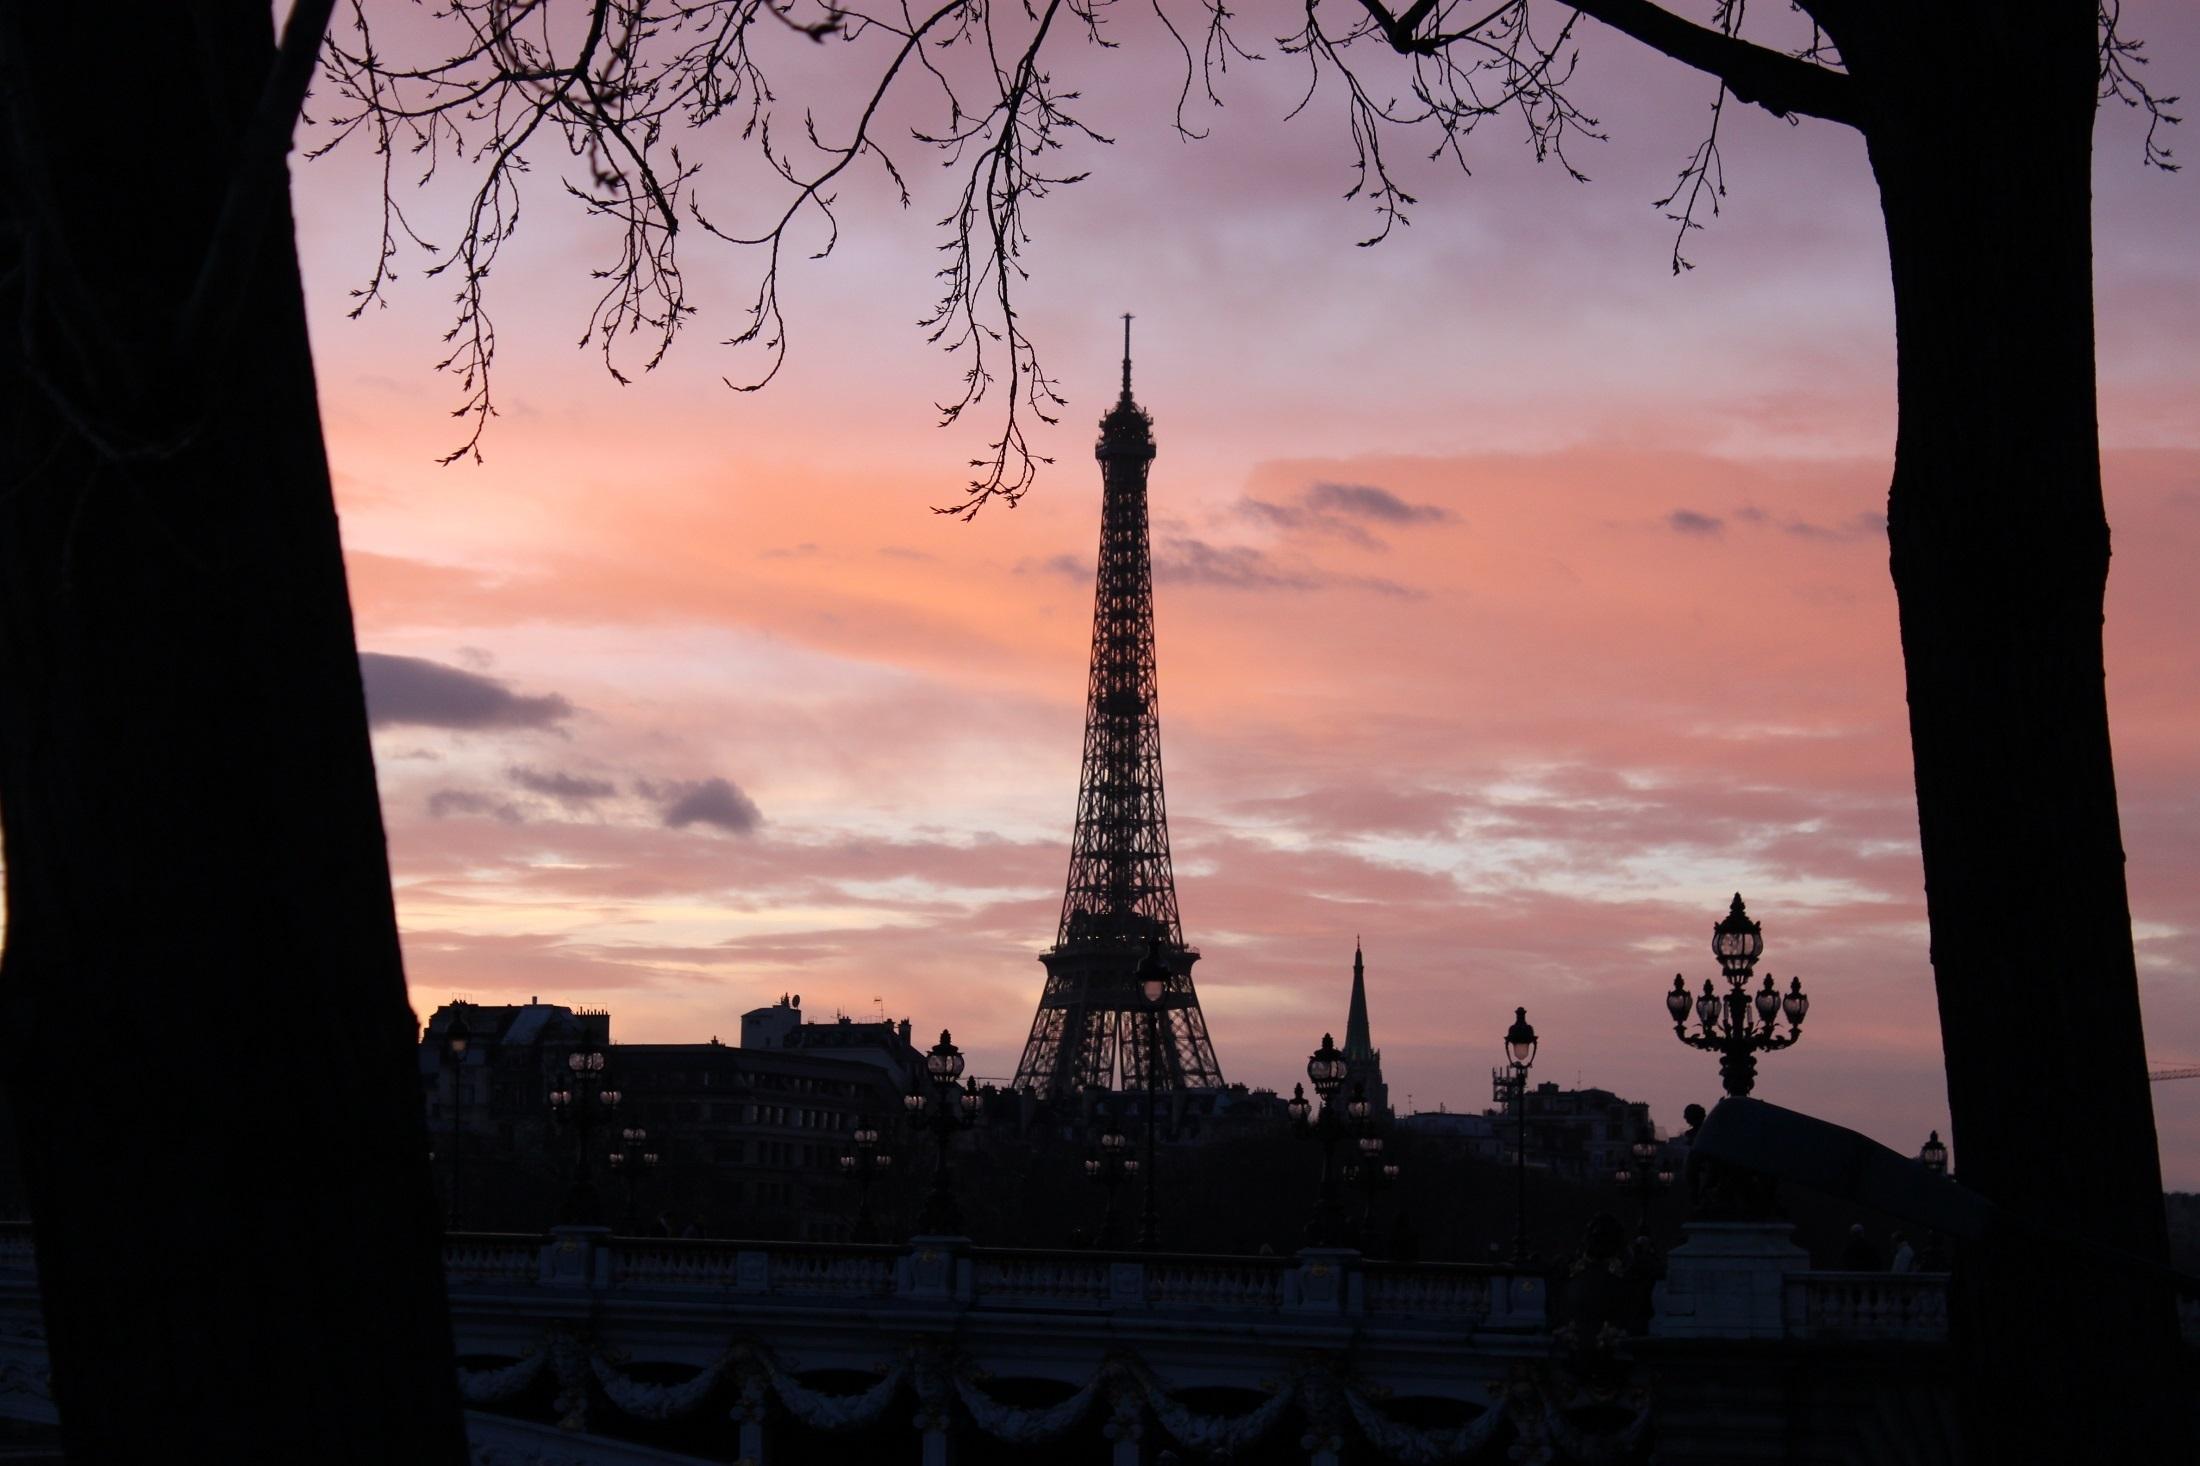 Plan Cul Femme Mariée Sur Bobigny Rdv Sexe Seine-Saint-Denis